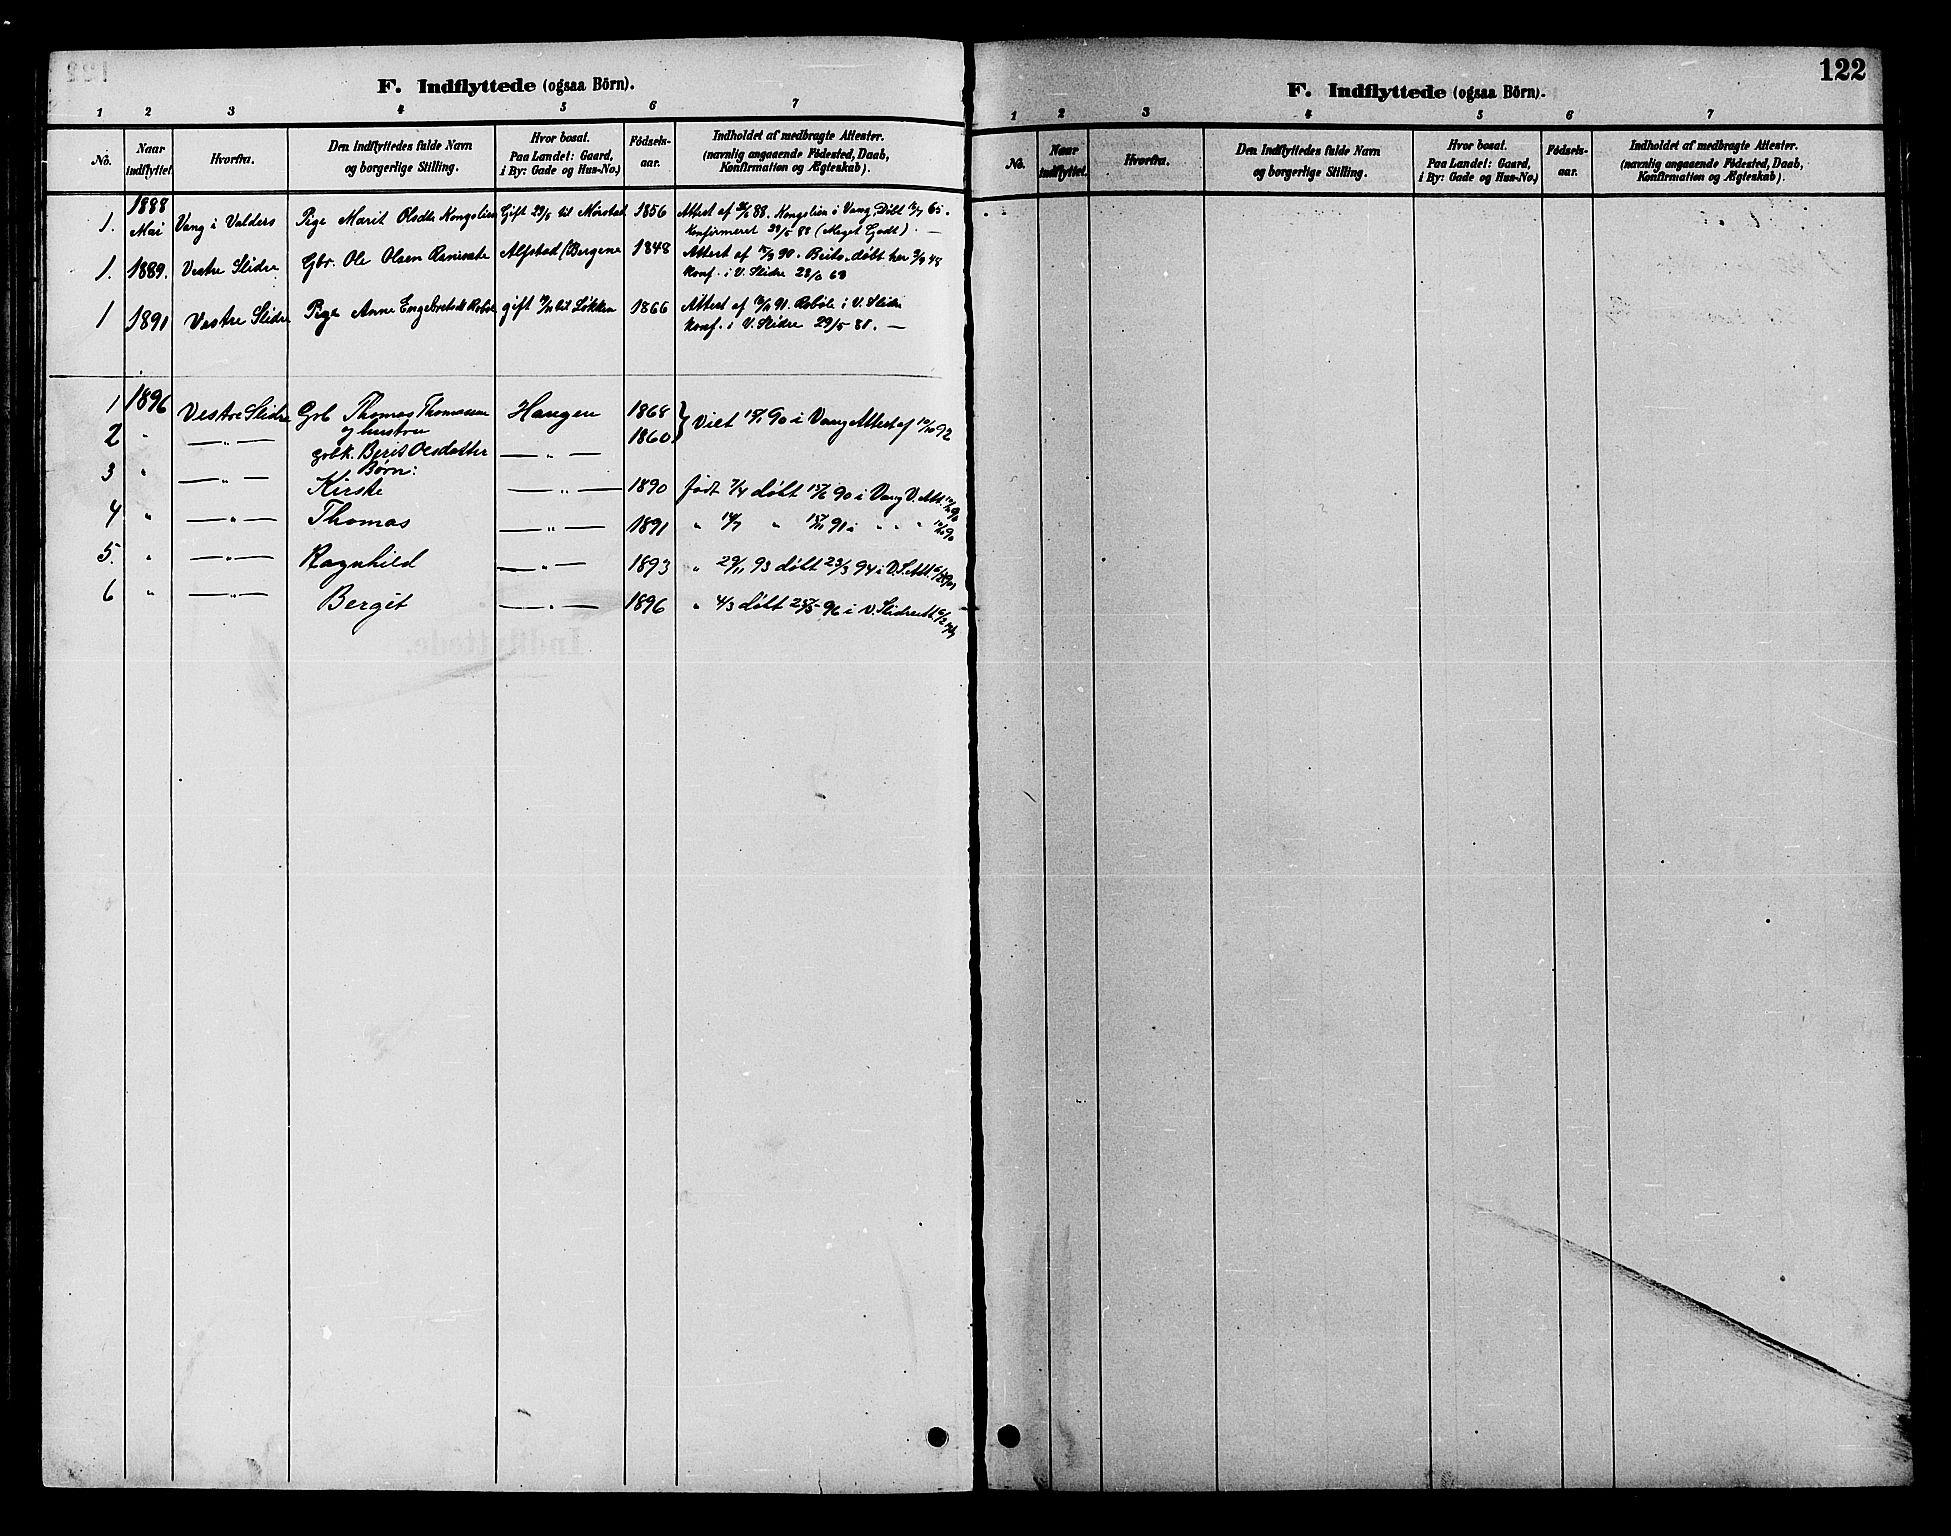 SAH, Øystre Slidre prestekontor, Klokkerbok nr. 4, 1887-1907, s. 122